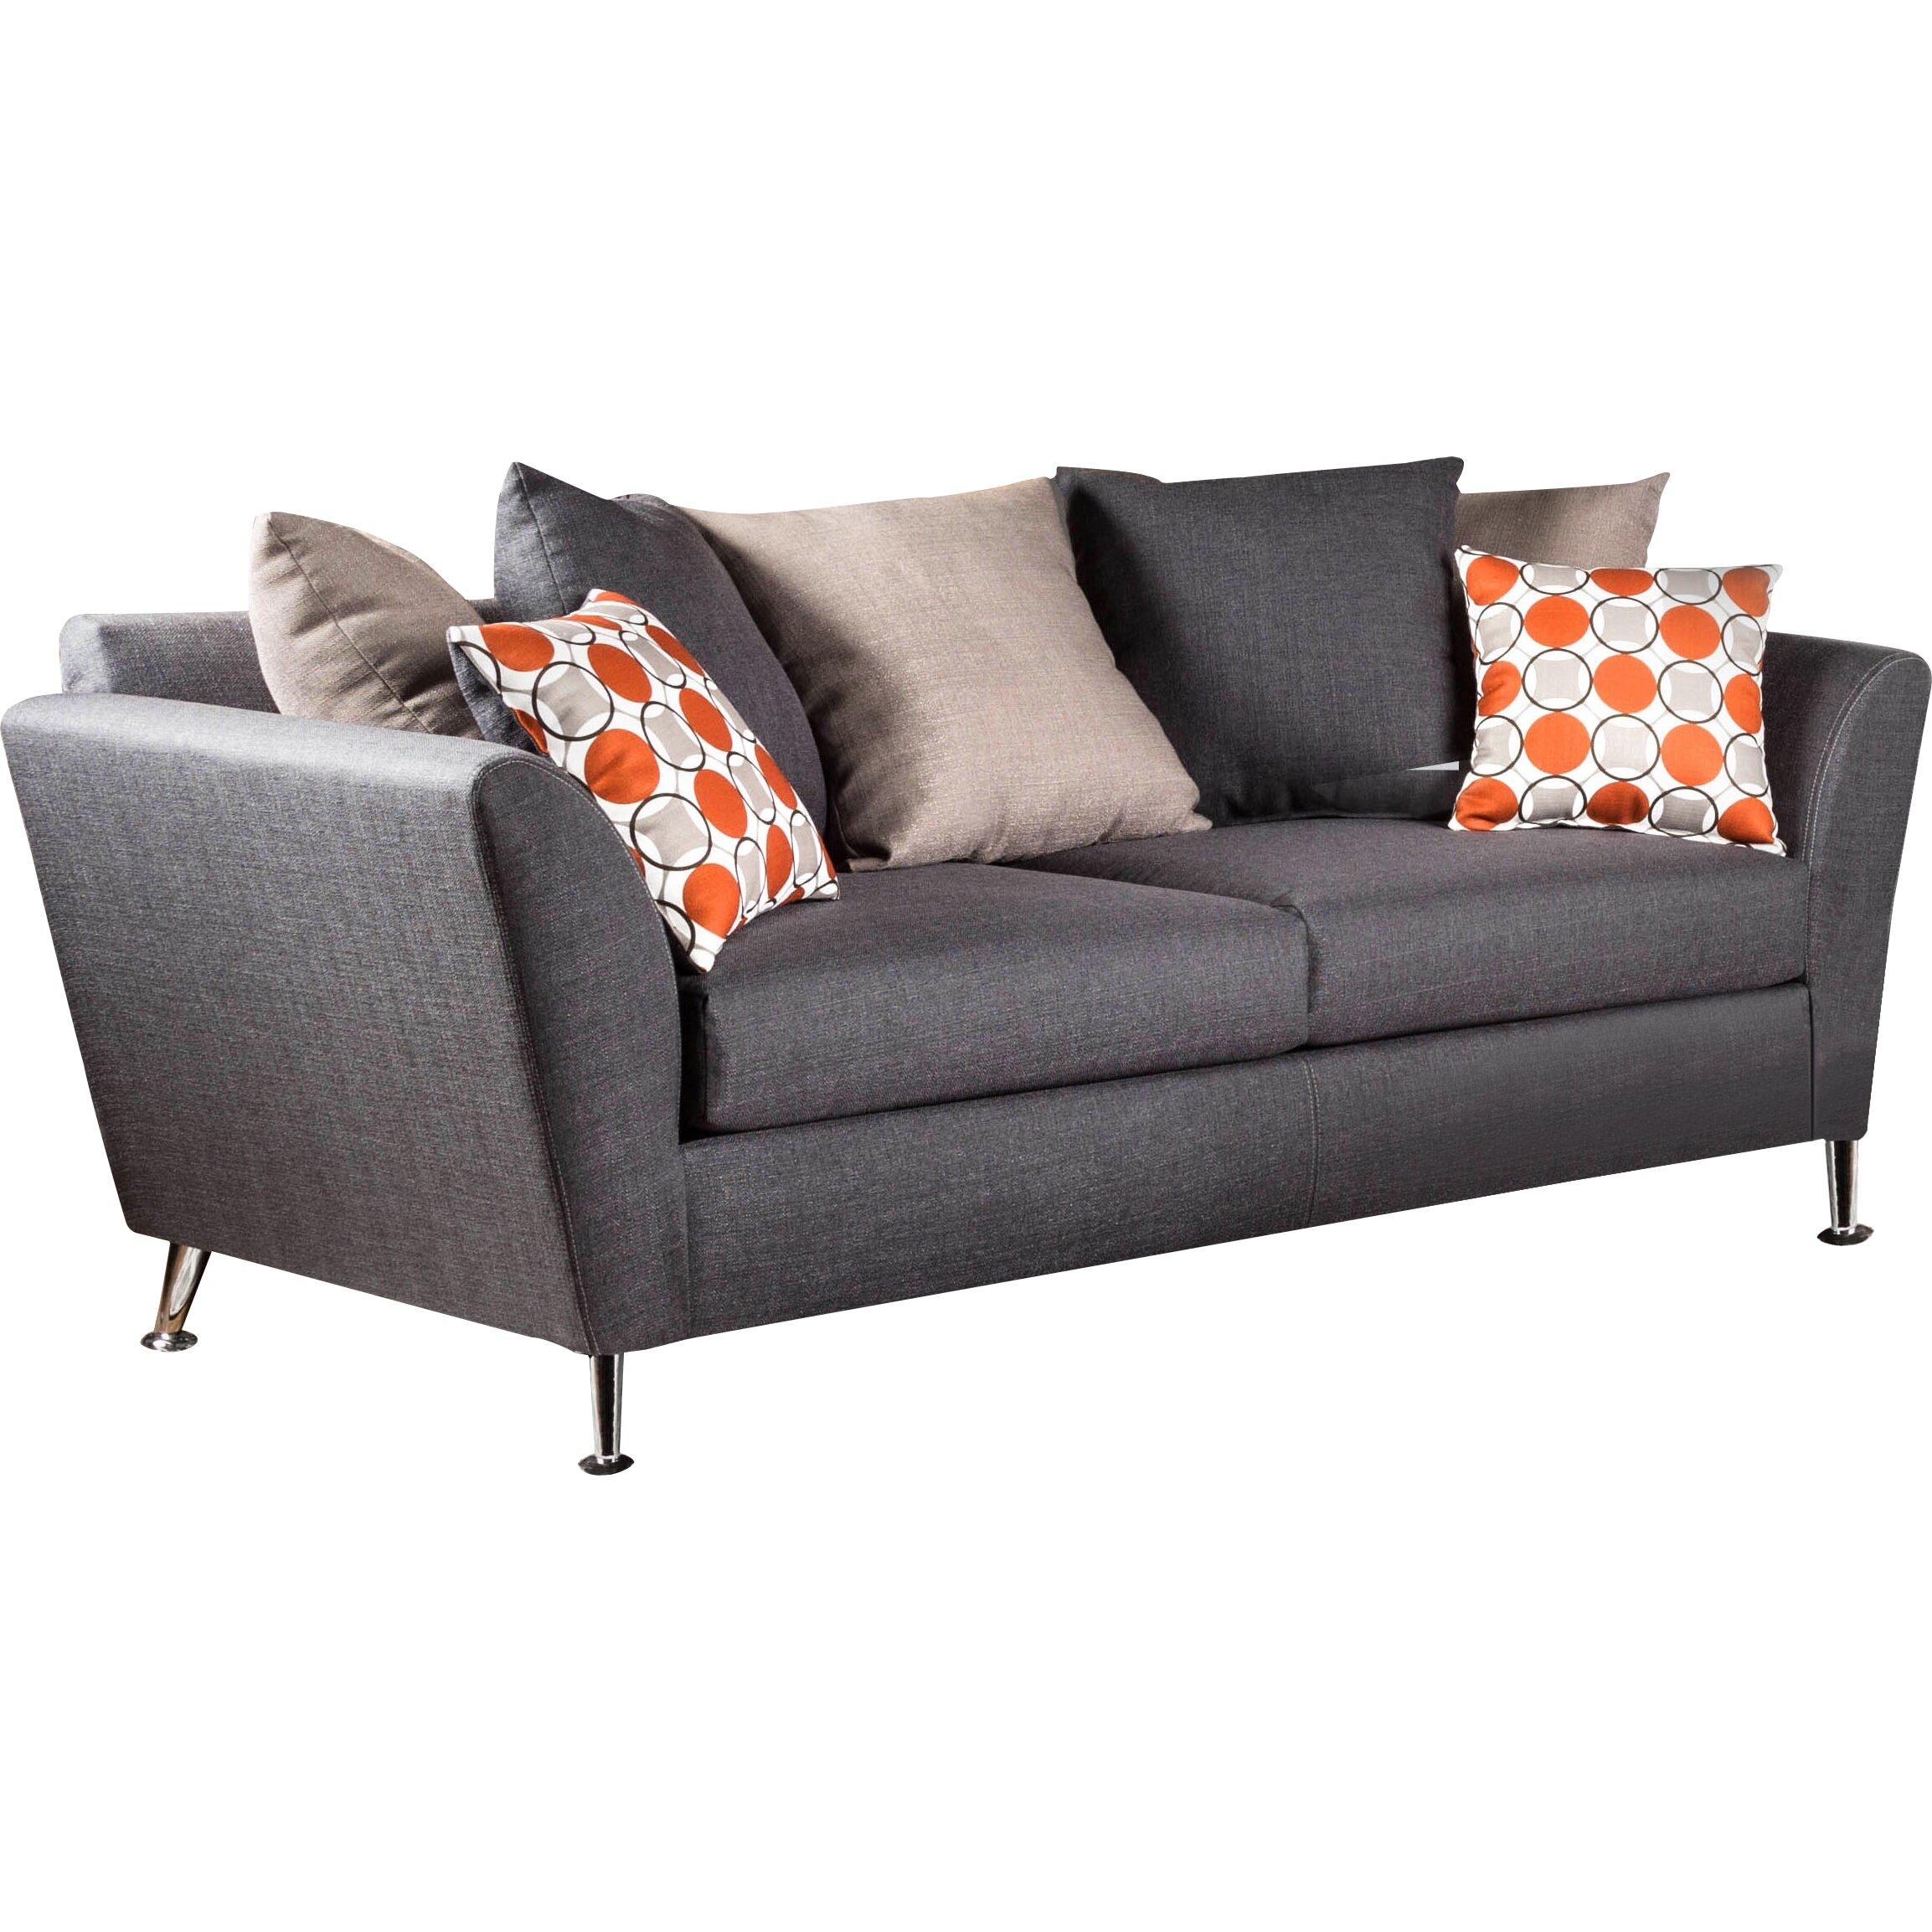 Brayden Studio Mcmurry Contemporary Sofa